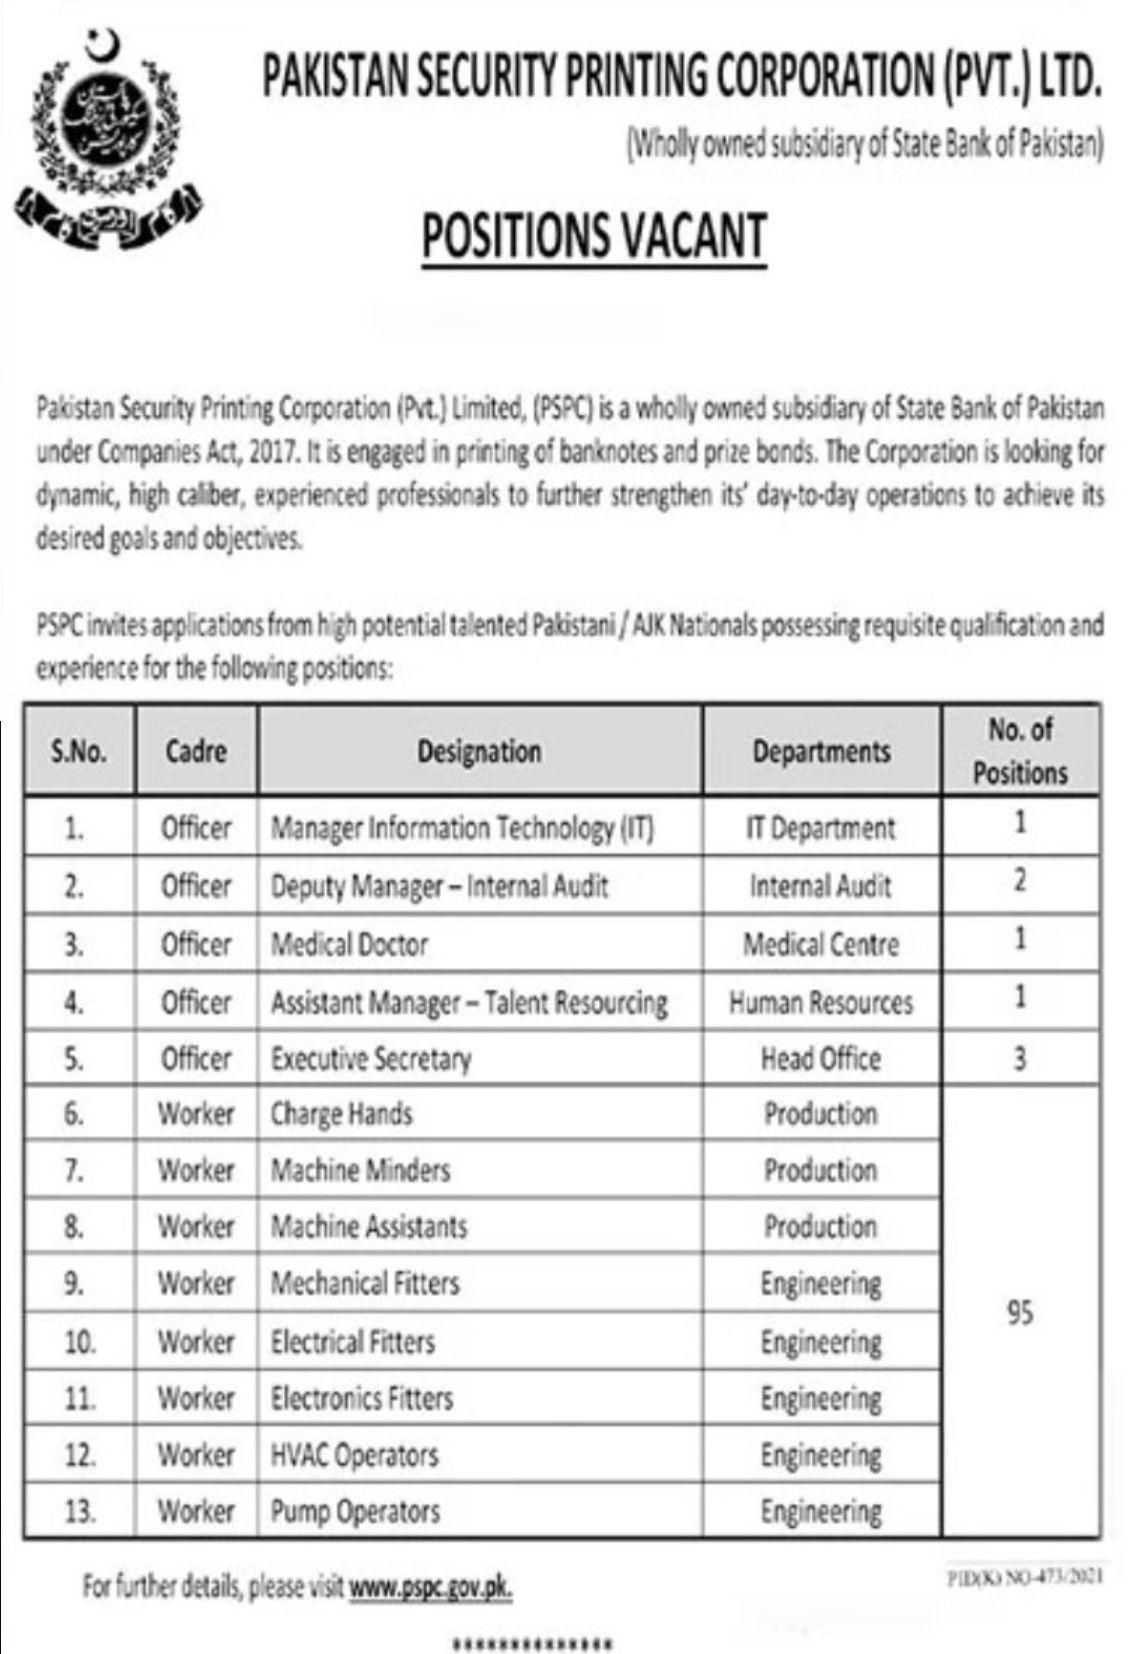 Pakistan Security Printing Corporation Pvt Ltd Vacancies 2021 2